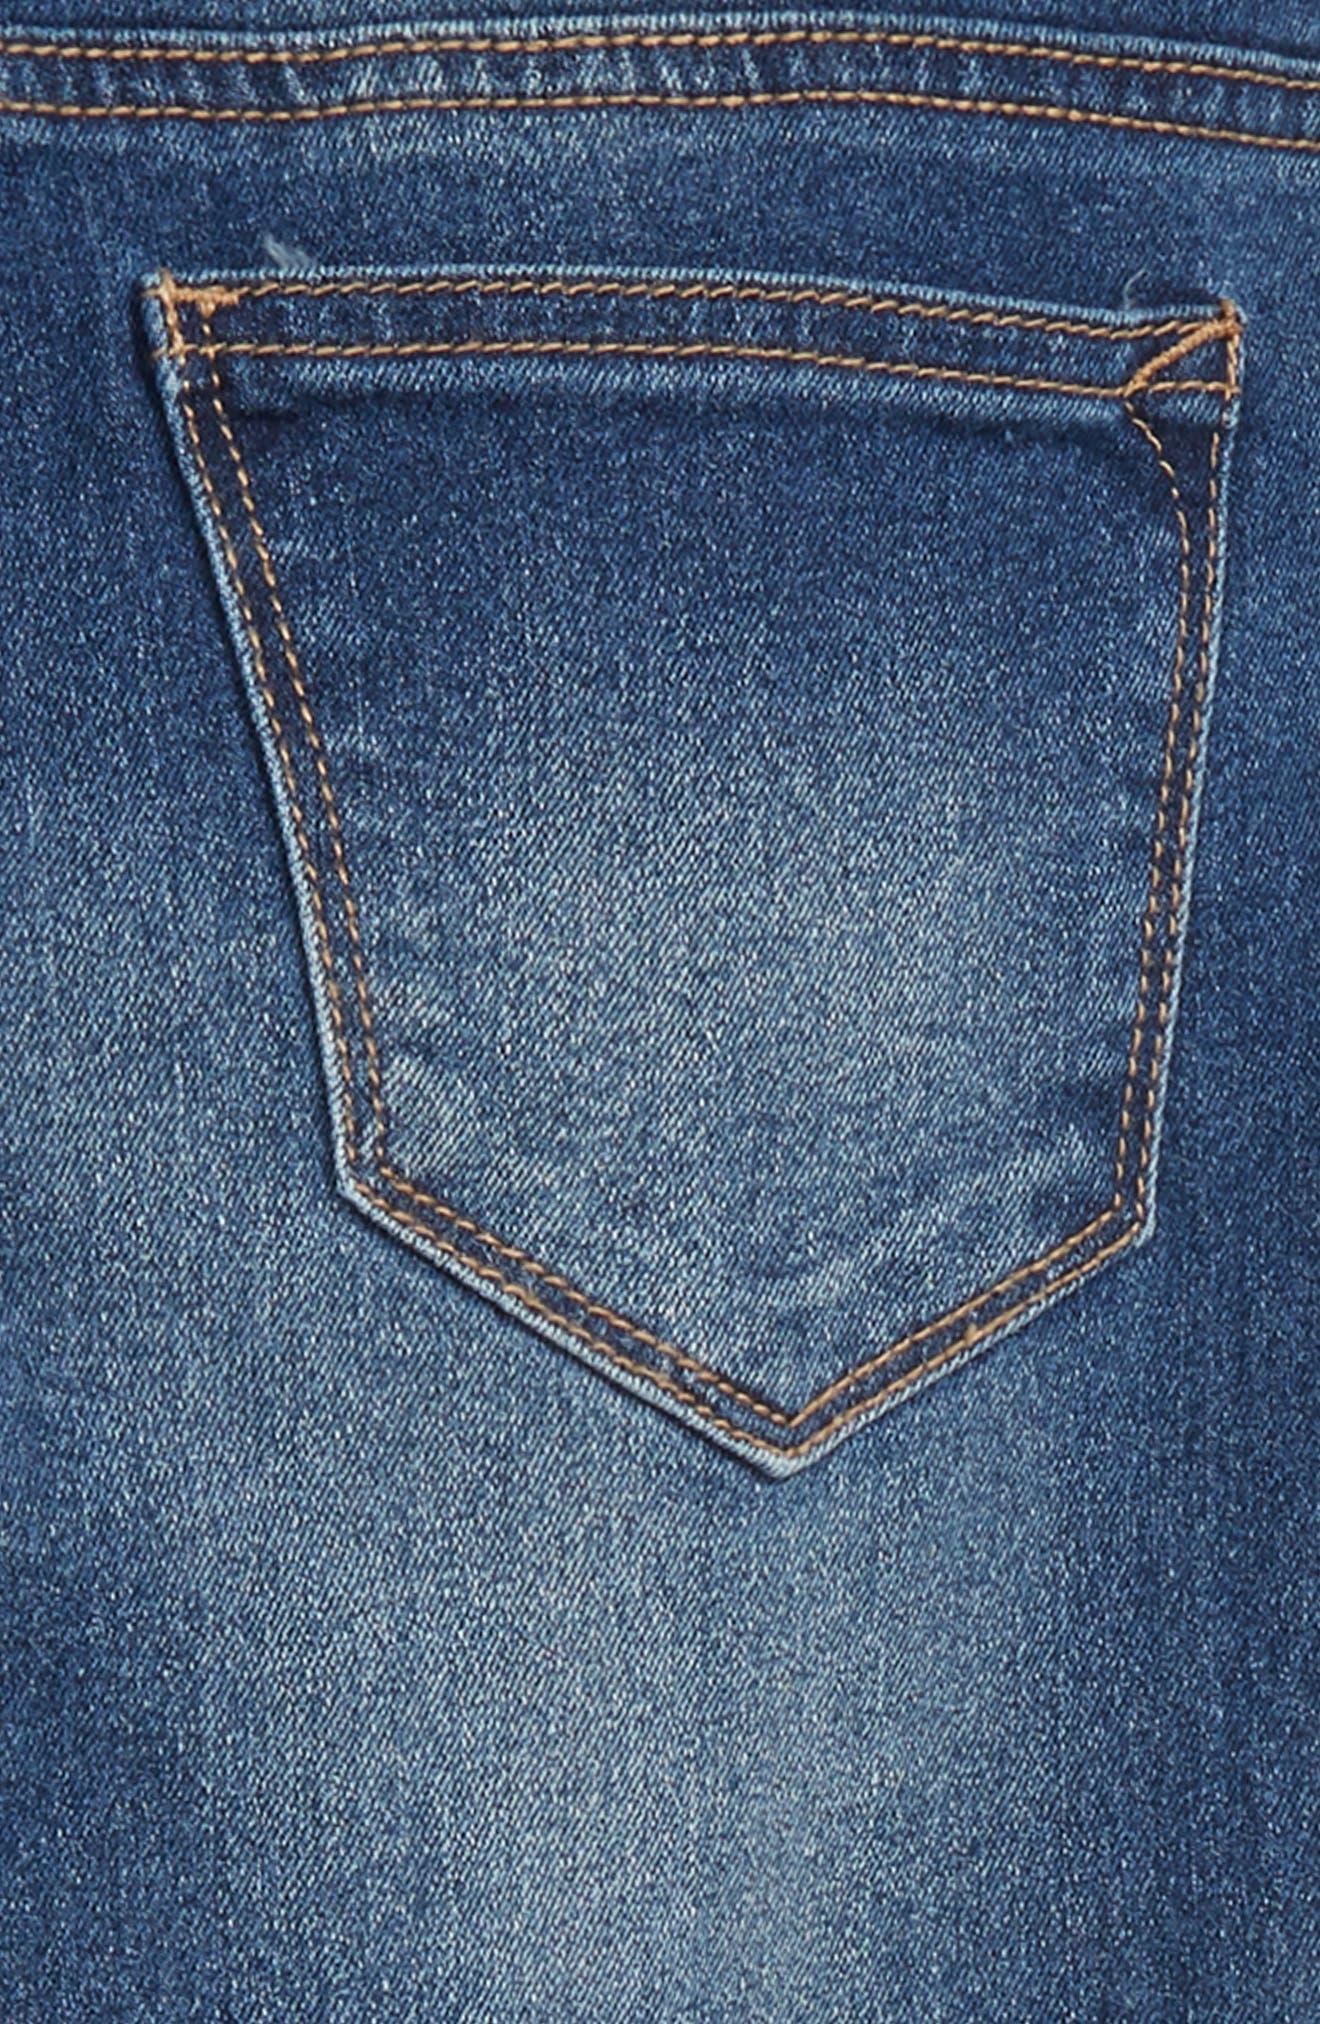 Star Appliqué Skinny Jeans,                             Alternate thumbnail 3, color,                             Blue